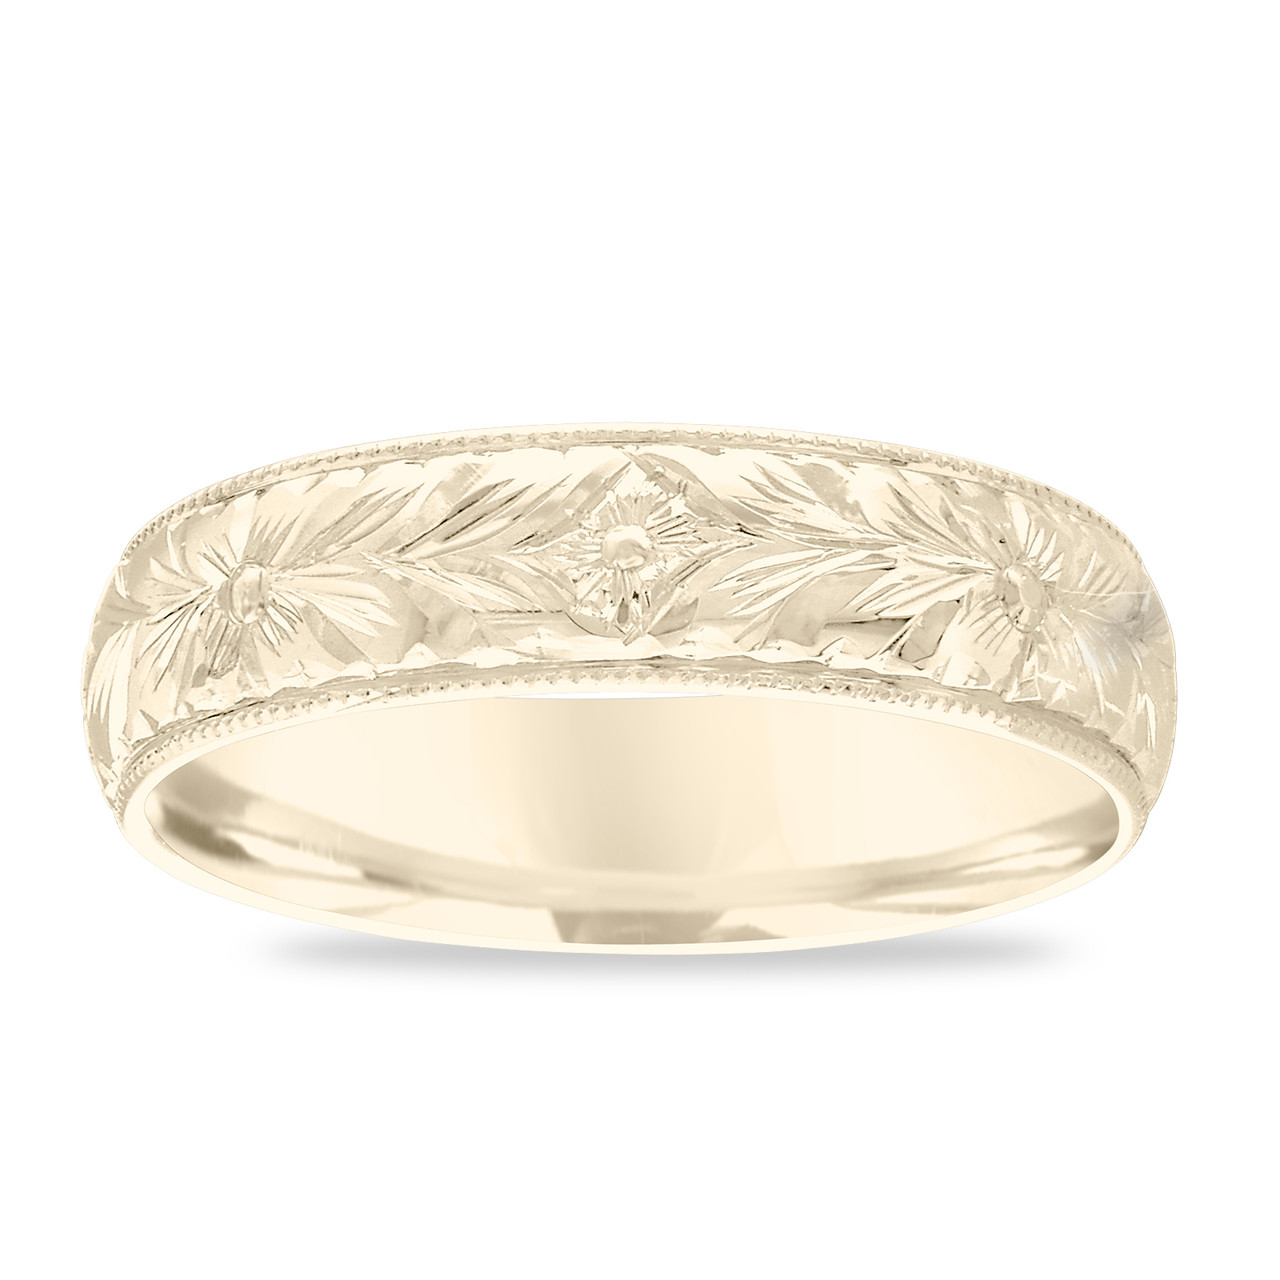 Hand Engraved Wedding Band, 18K Gold Men\u0027s Wedding Ring, Vintage Wedding  Band, Antique Yellow Gold Wedding Band 6 mm Unique Handmade